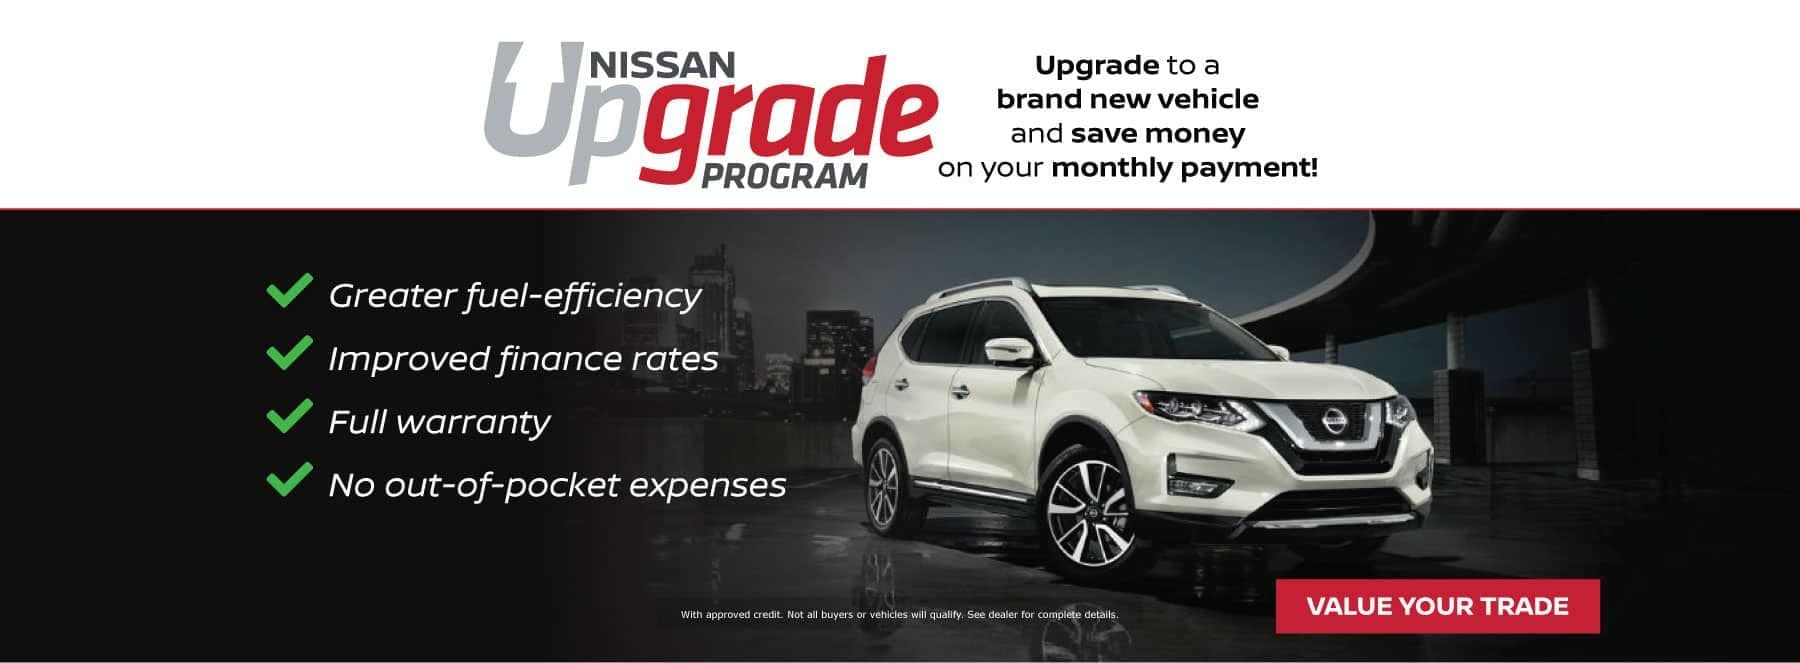 NissanUpgradeProgram